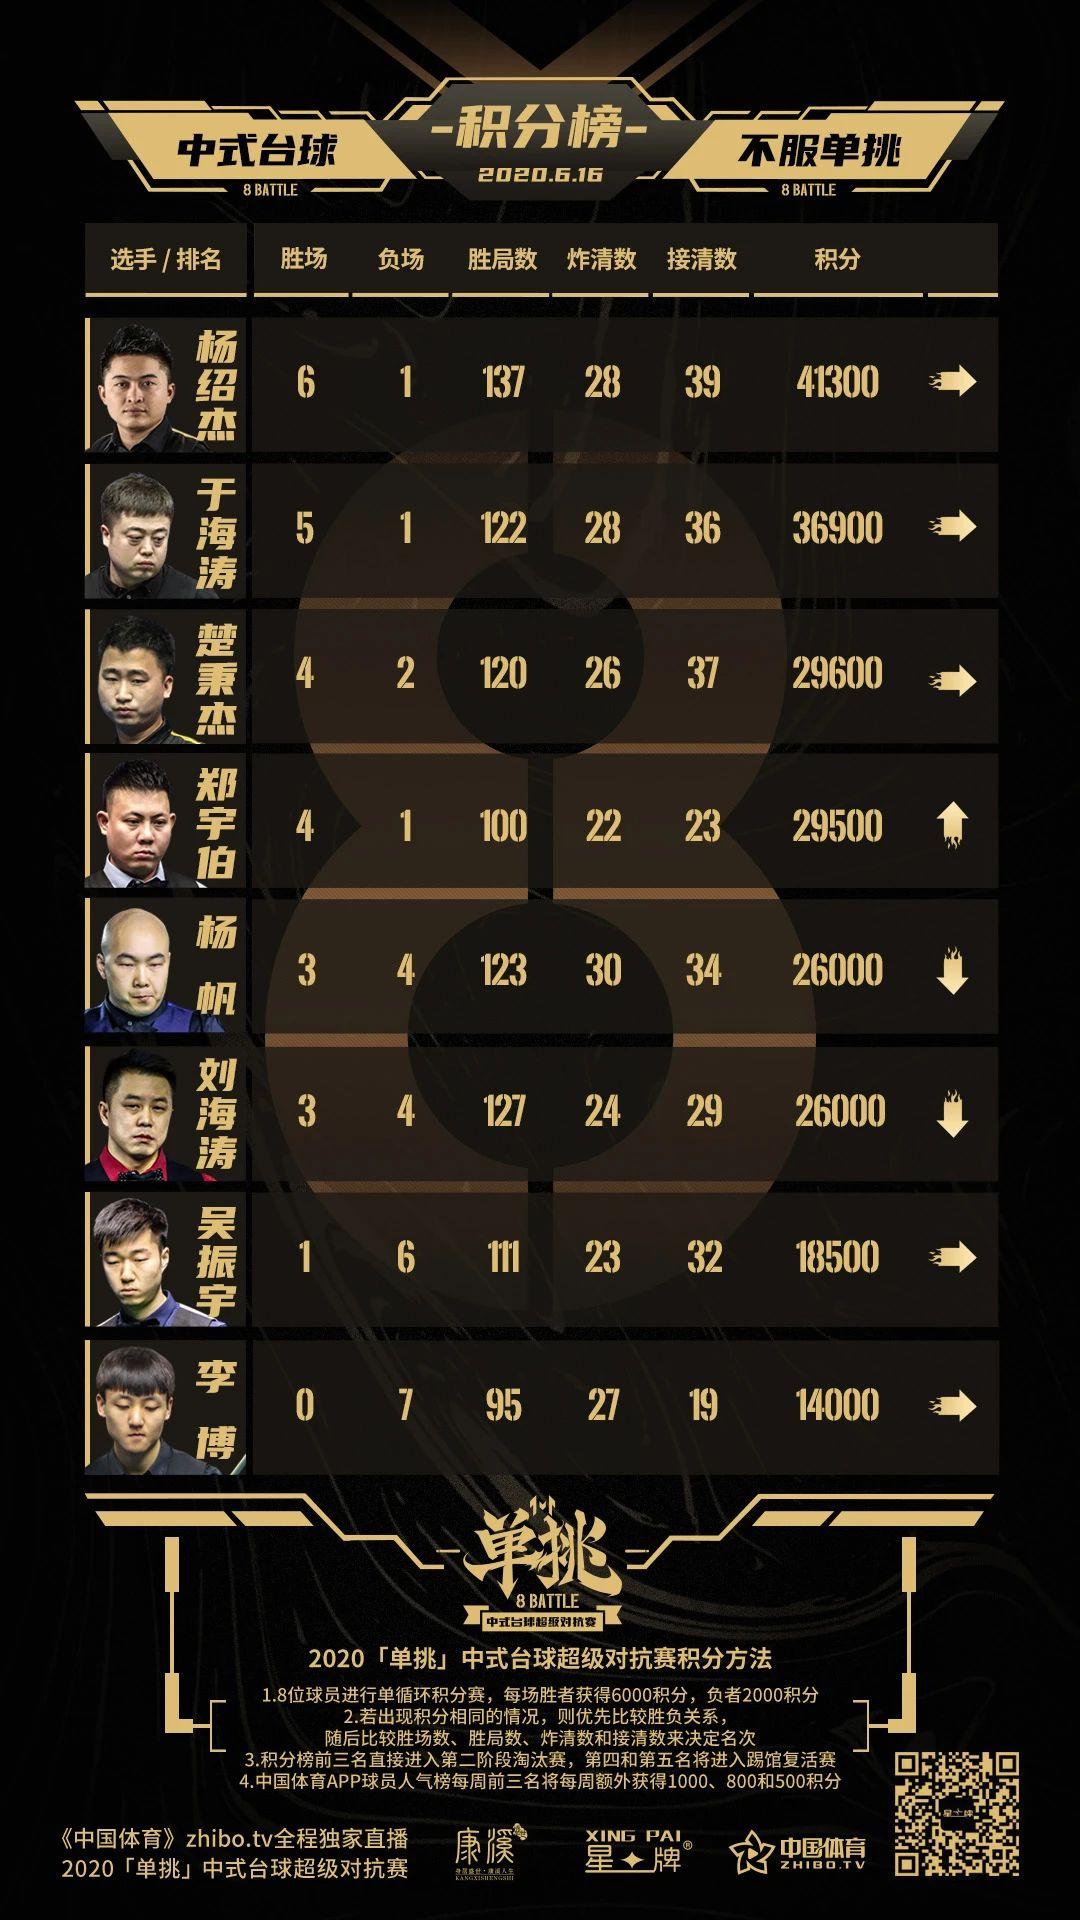 [Single Challenge] Continued firepower Zheng Yubo wins again